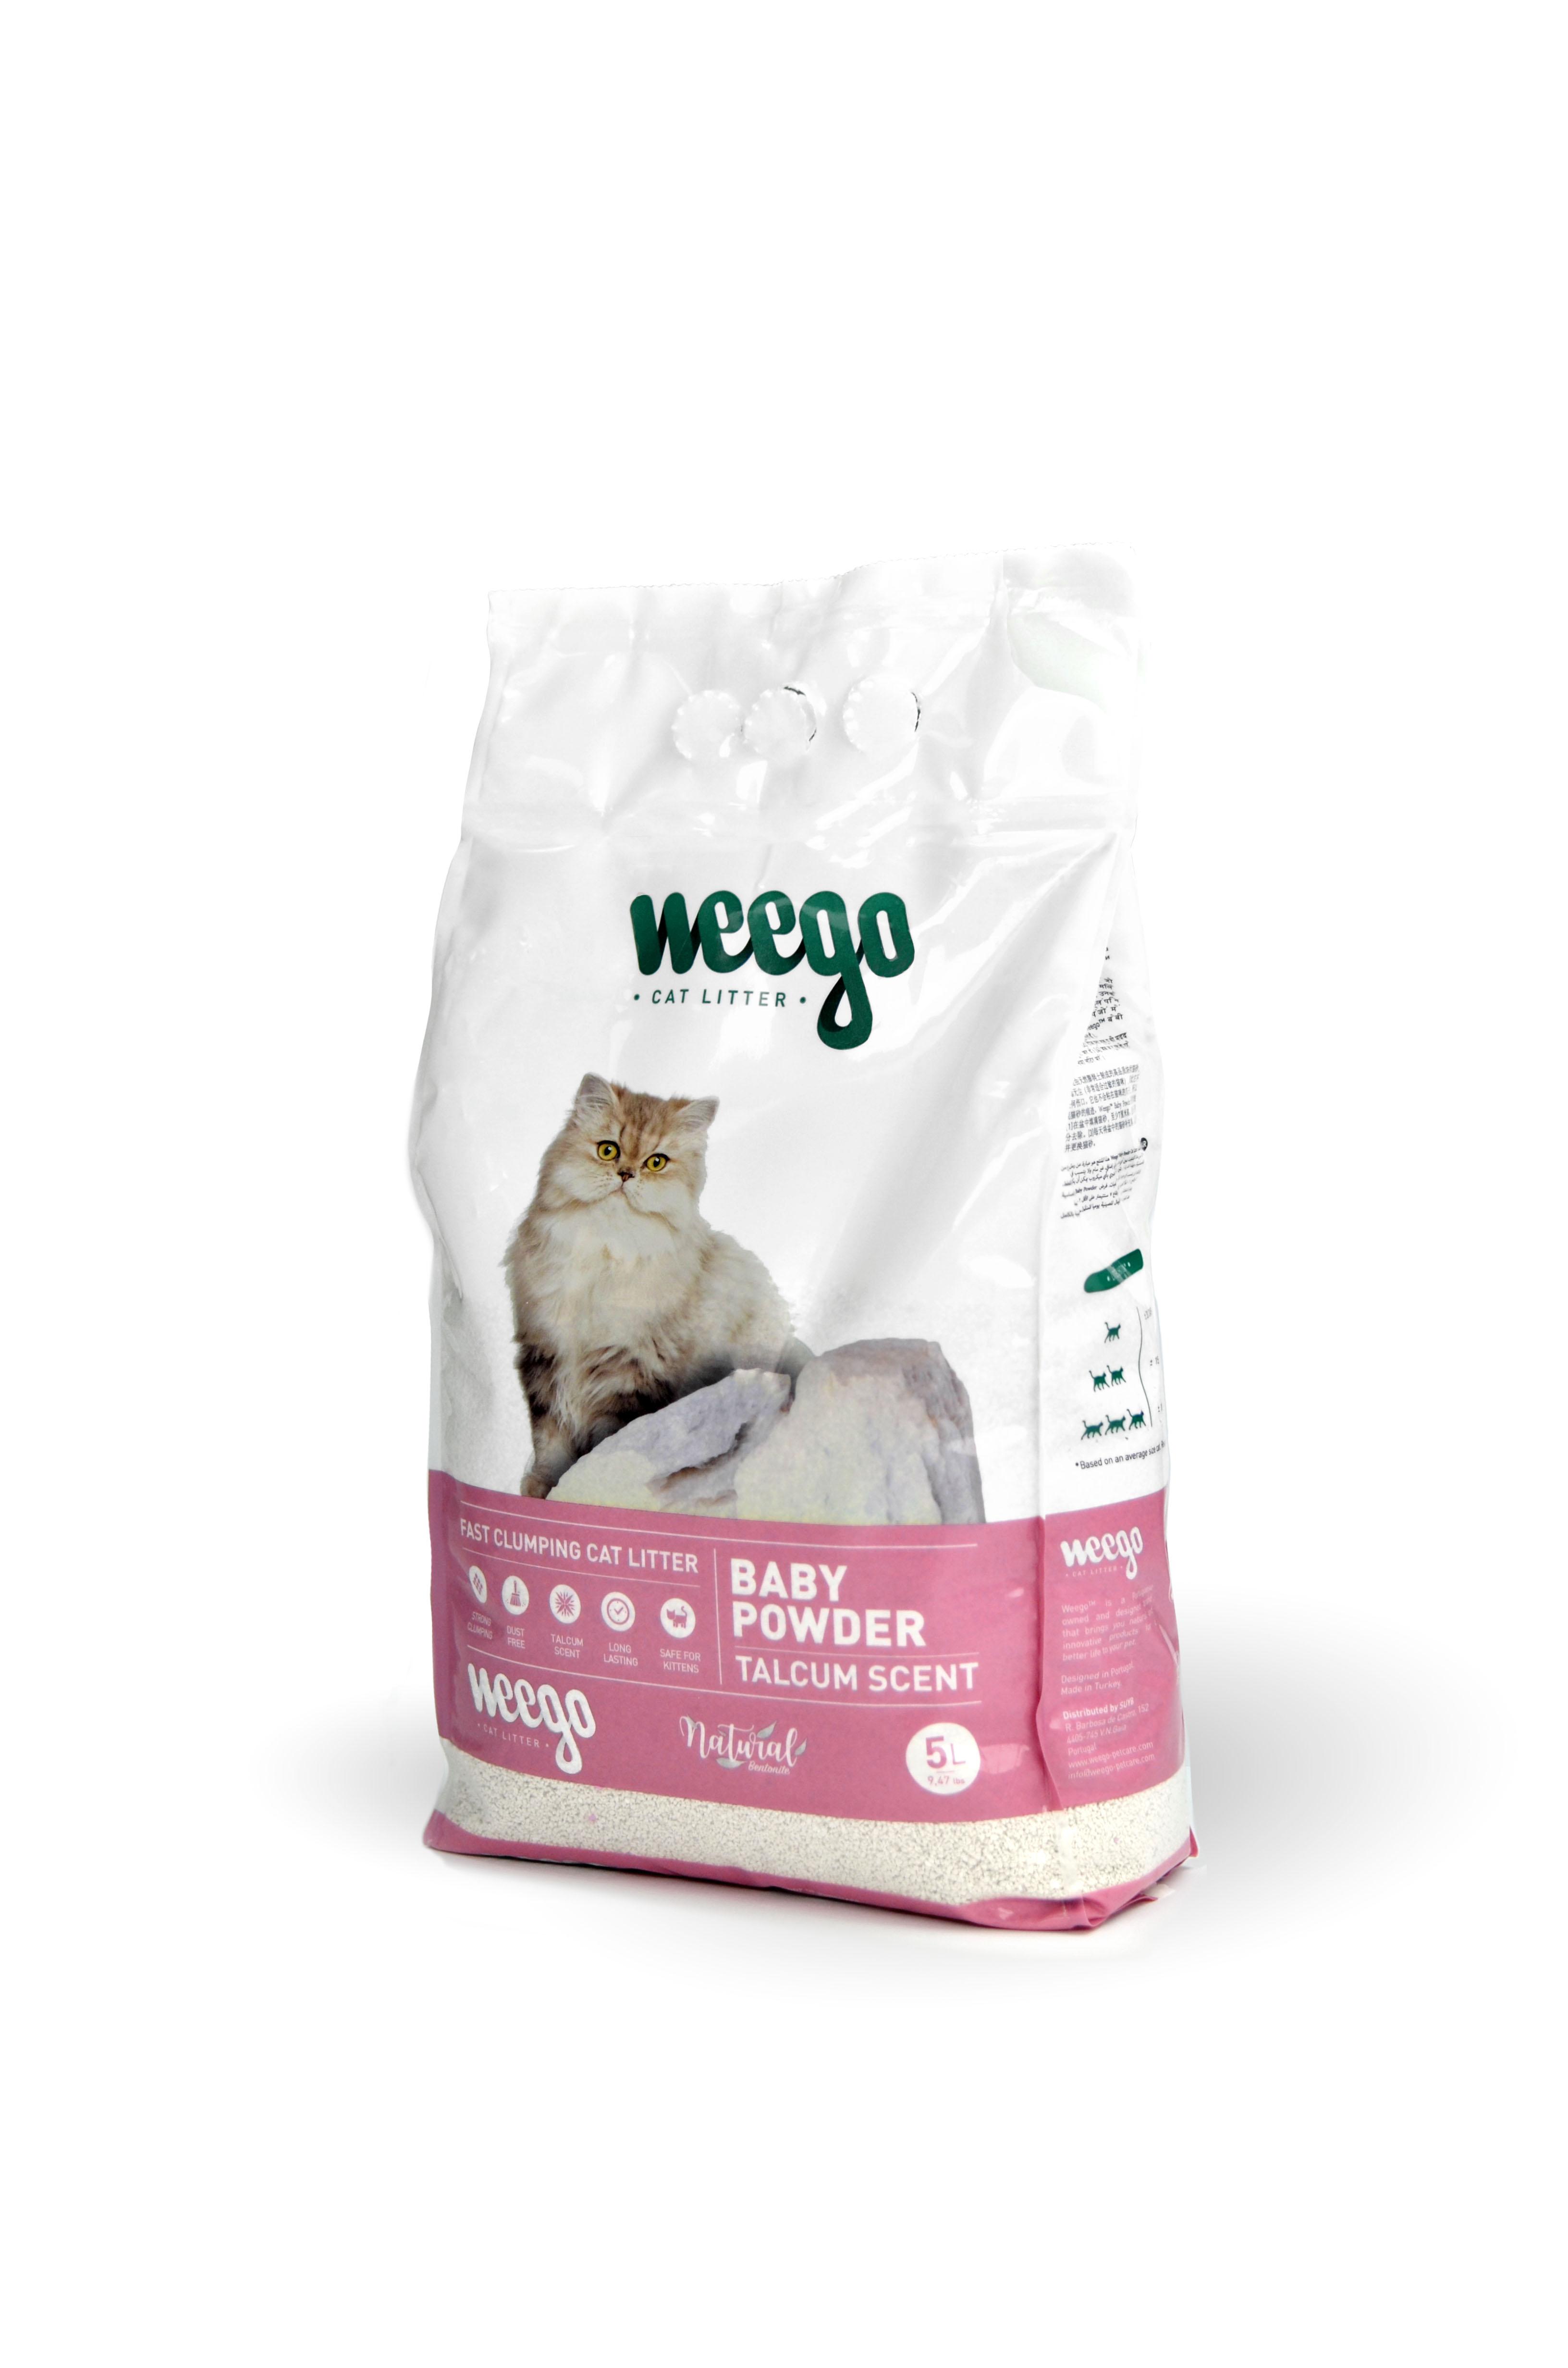 Areia para Gato Aglomerante Weego Baby Powder 5 lt